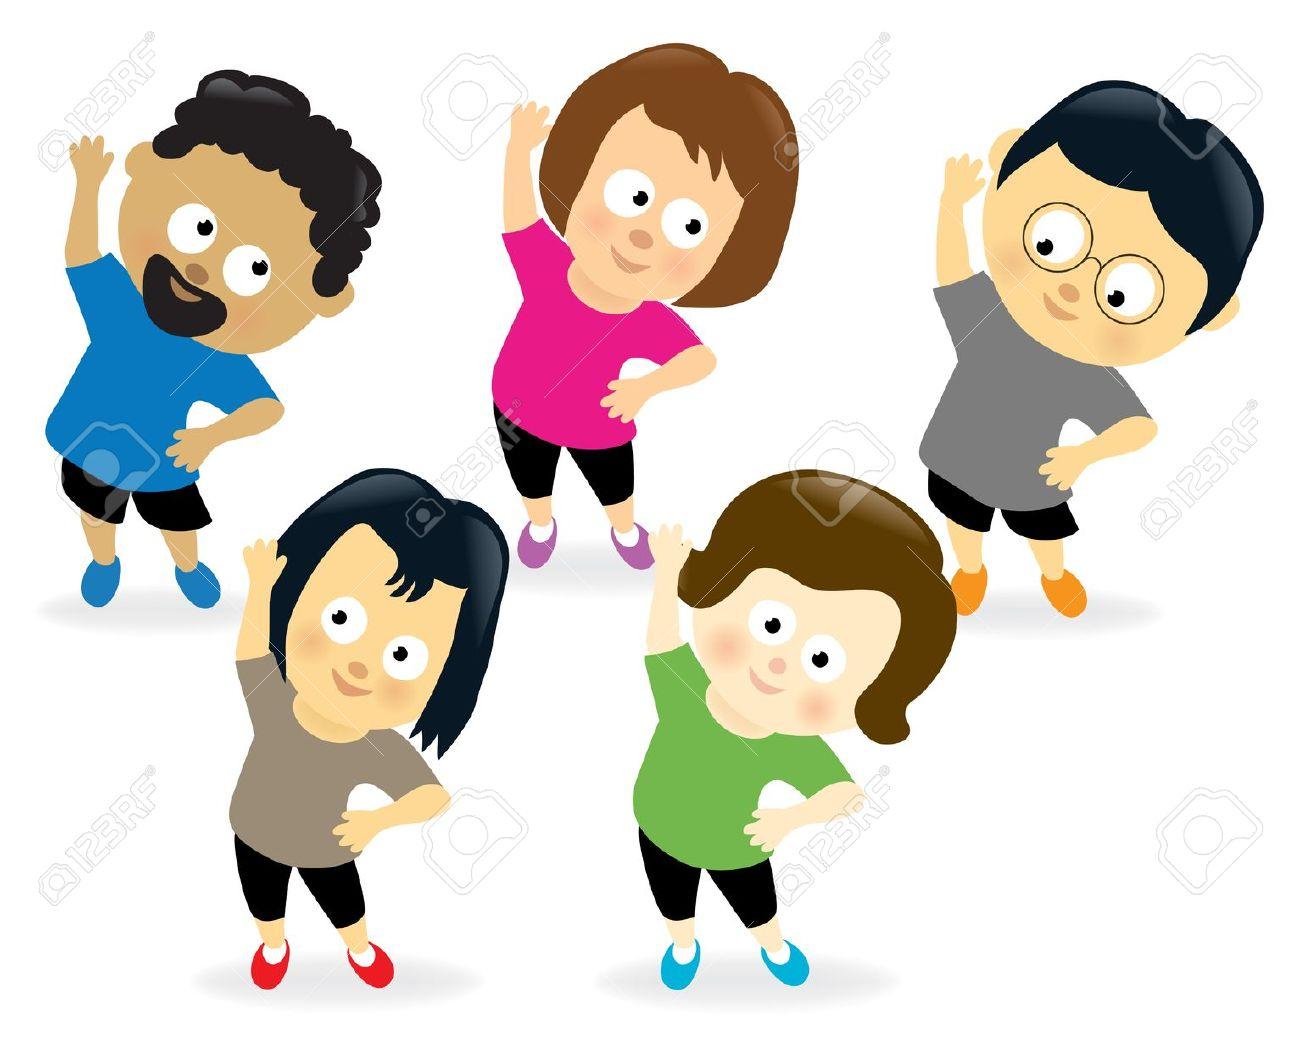 Exercise Clip Art Images.